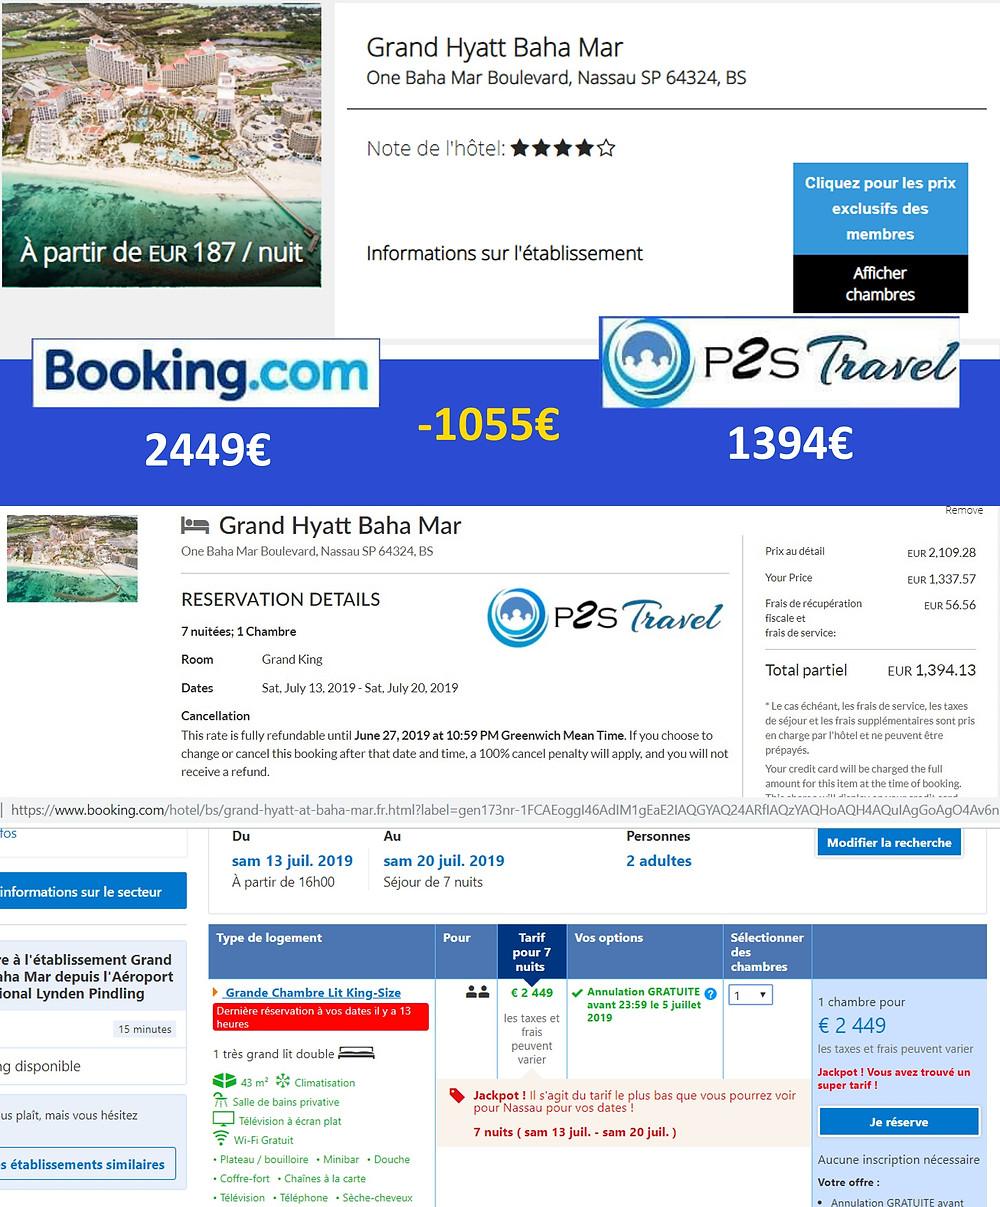 comparatif tarifs hôtel Grand Hyatt Baha Mar Bahamas P2S Travel Vs Booking